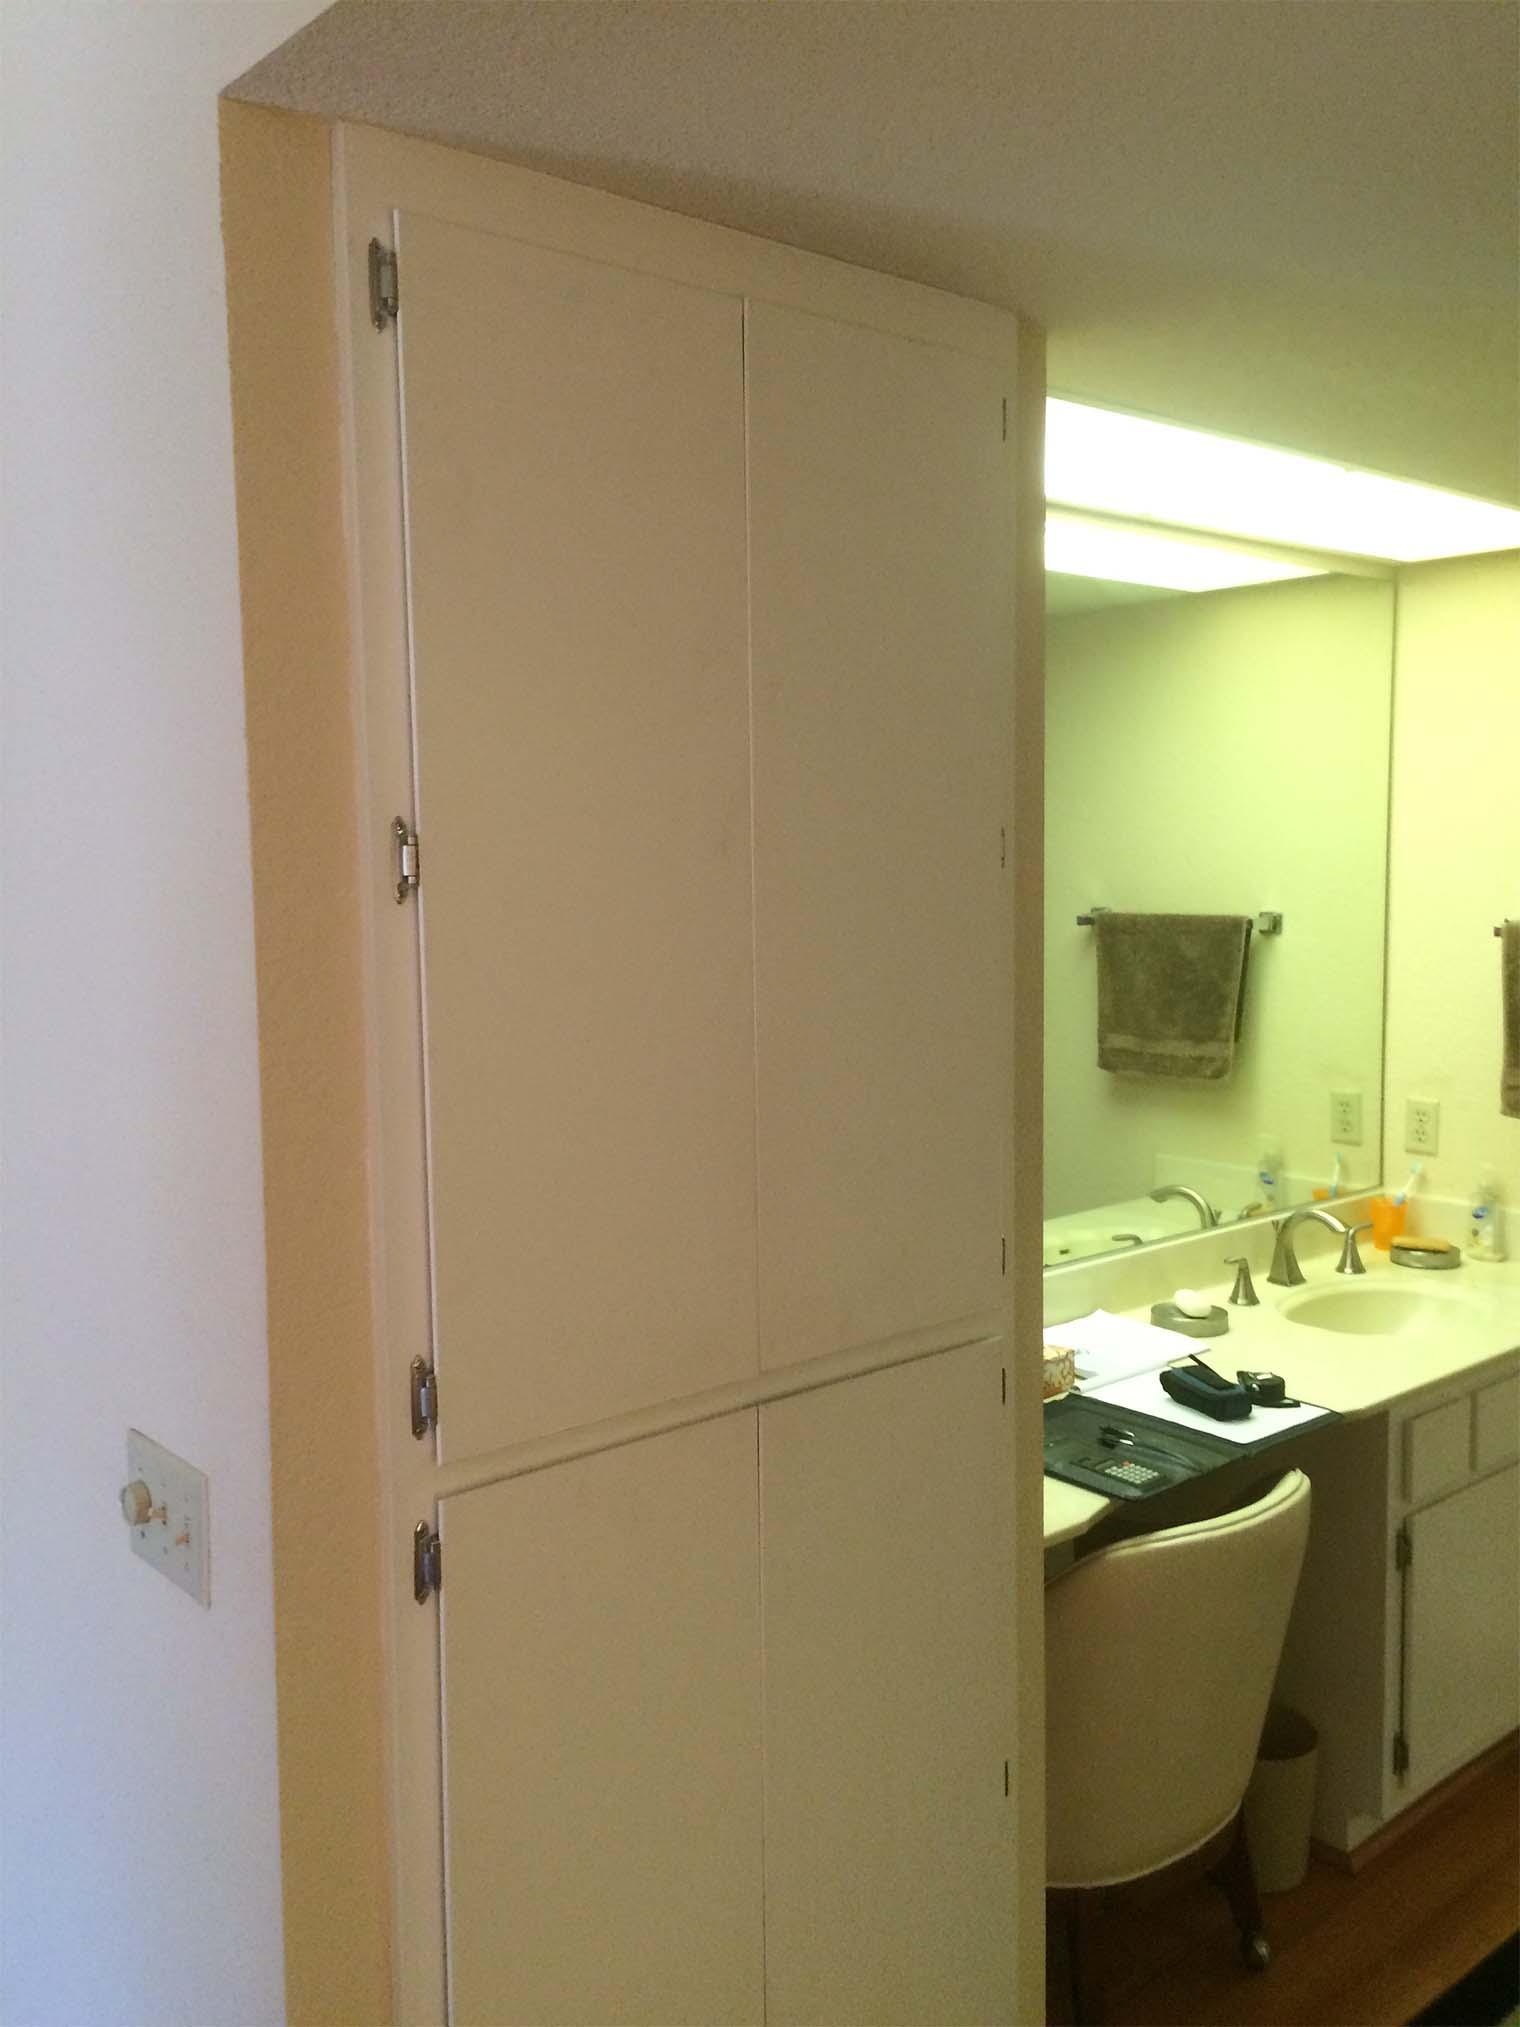 Cabinets Palm Desert CaPalm Springs Bathroom Remodel RBC - Bathroom remodel palm desert ca